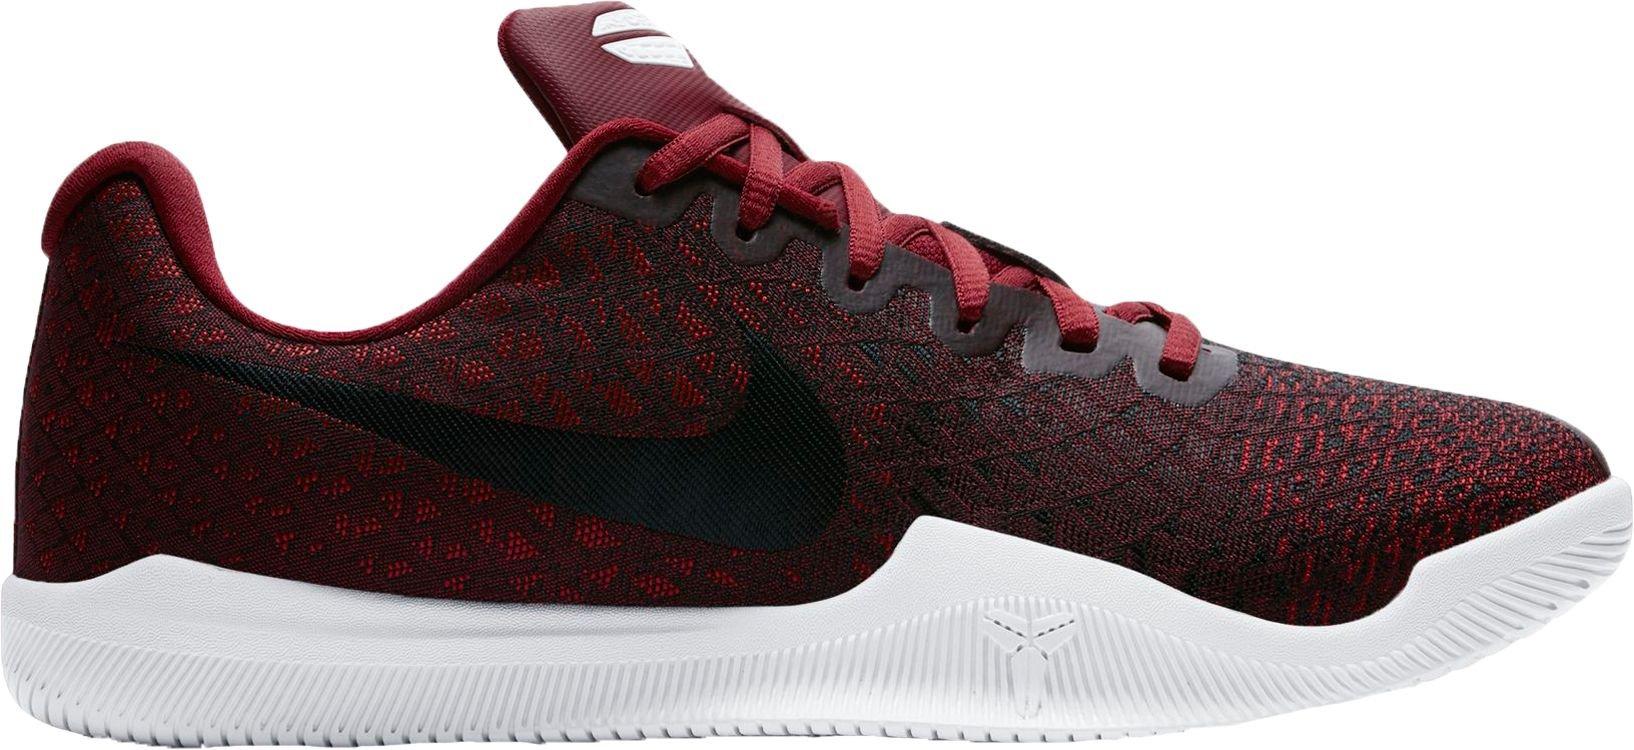 Nike Men's Kobe Mamba Instinct Basketball Shoes (8, Red/White-M)